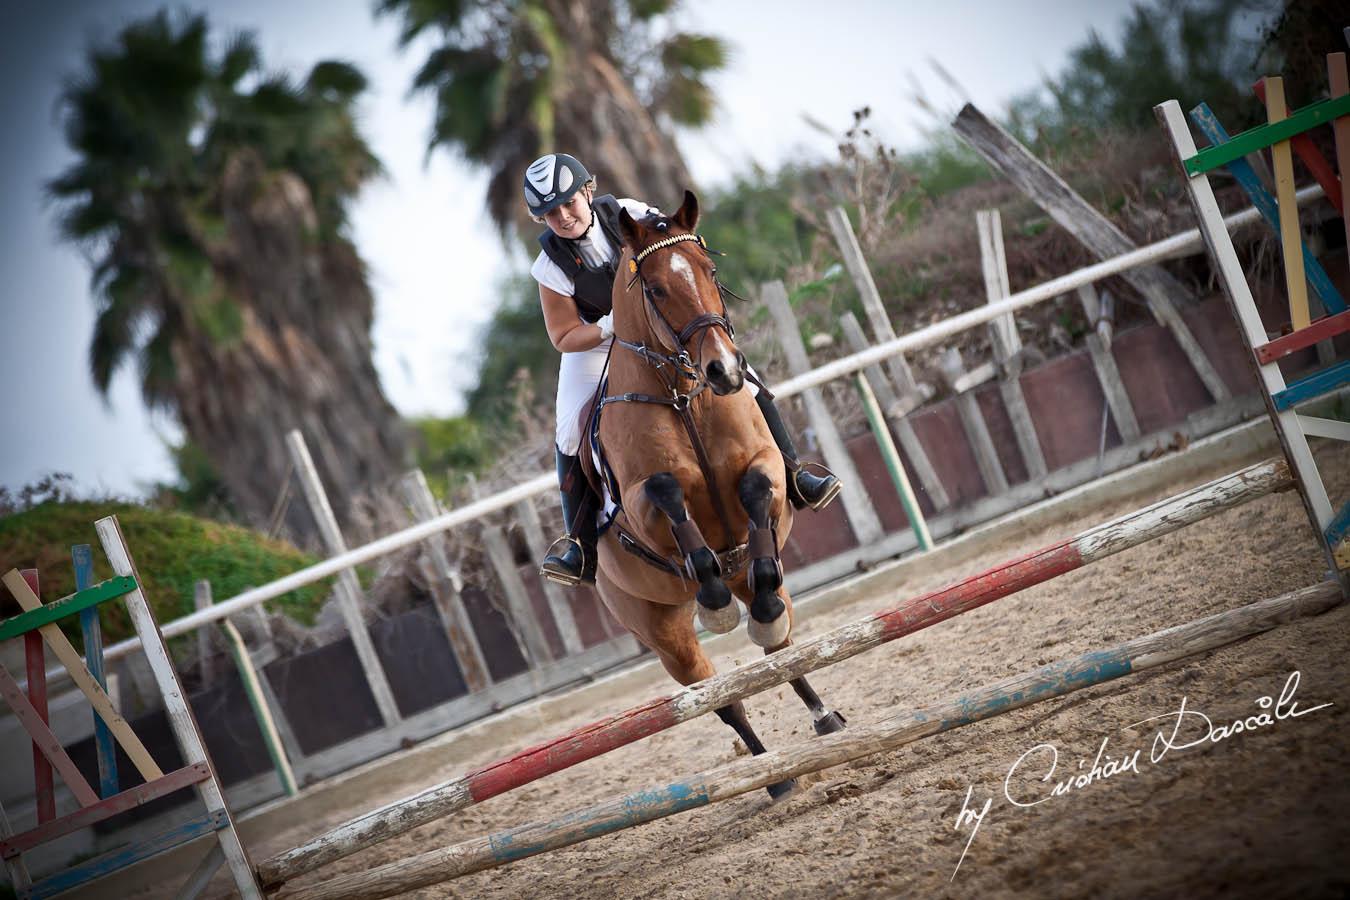 Curium Equestrian Center Horse Riding Competition Of 2011